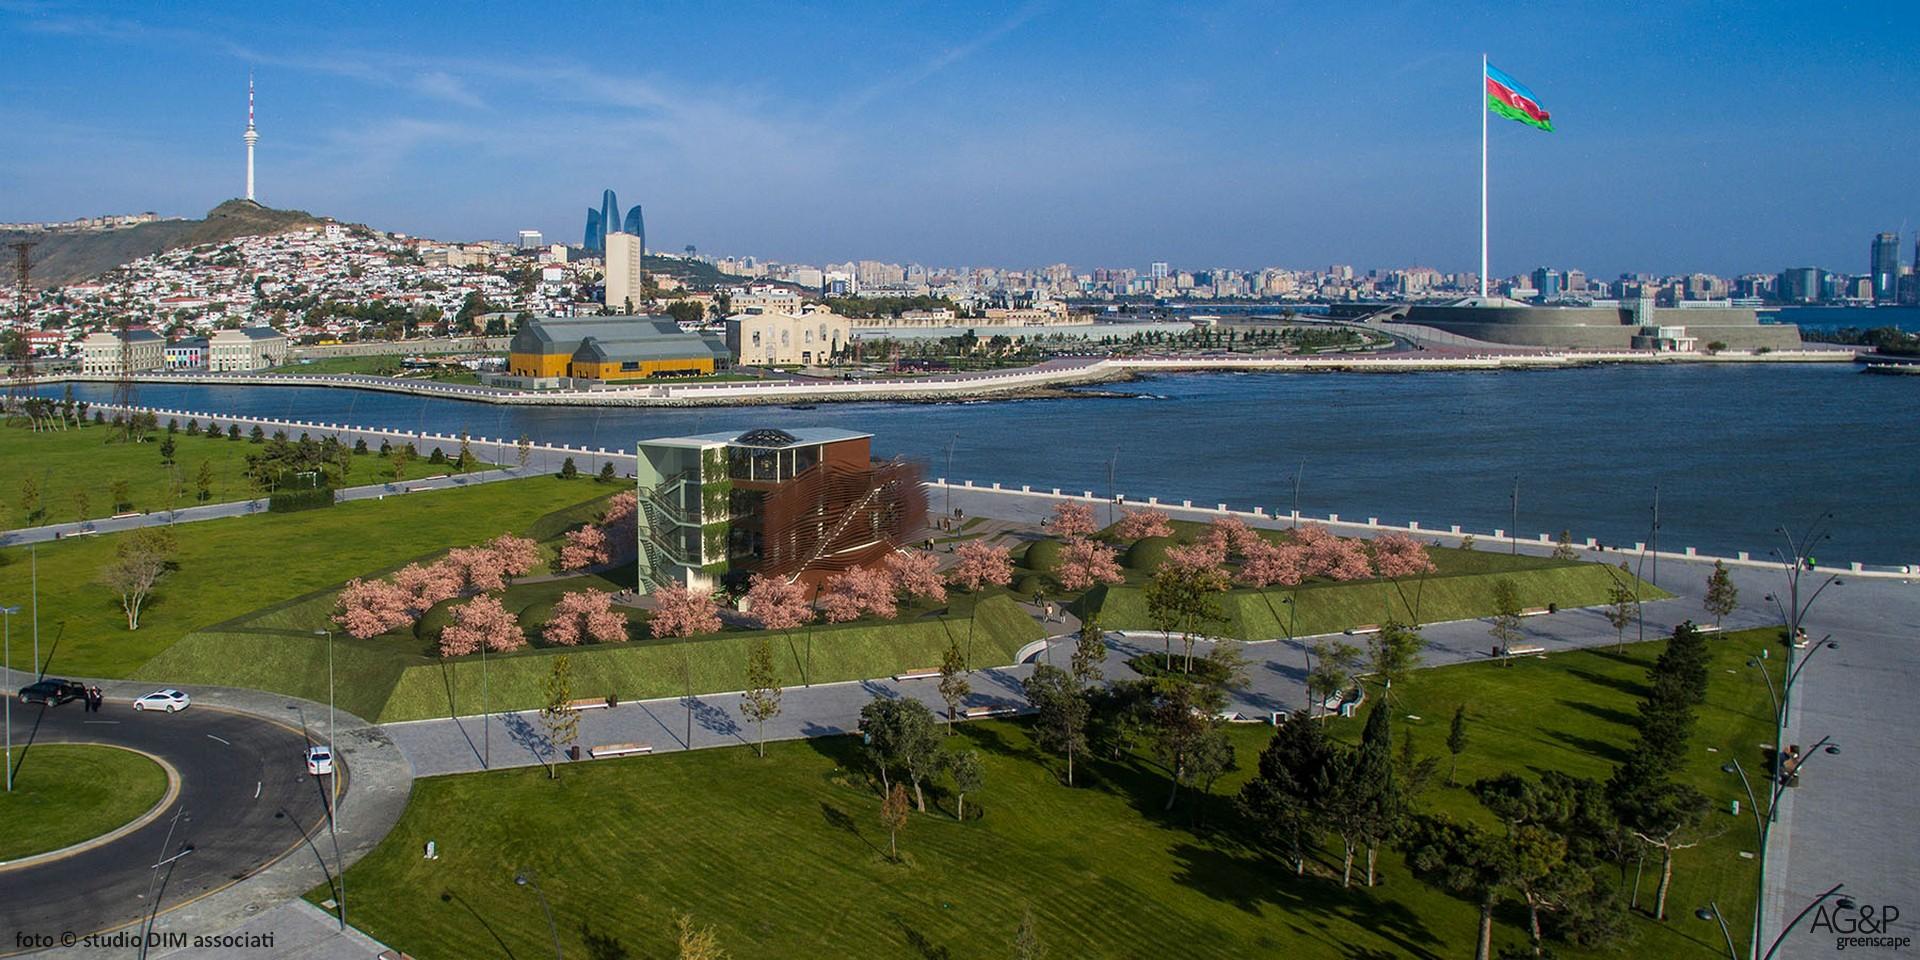 The Expo Pavilion flies to Baku